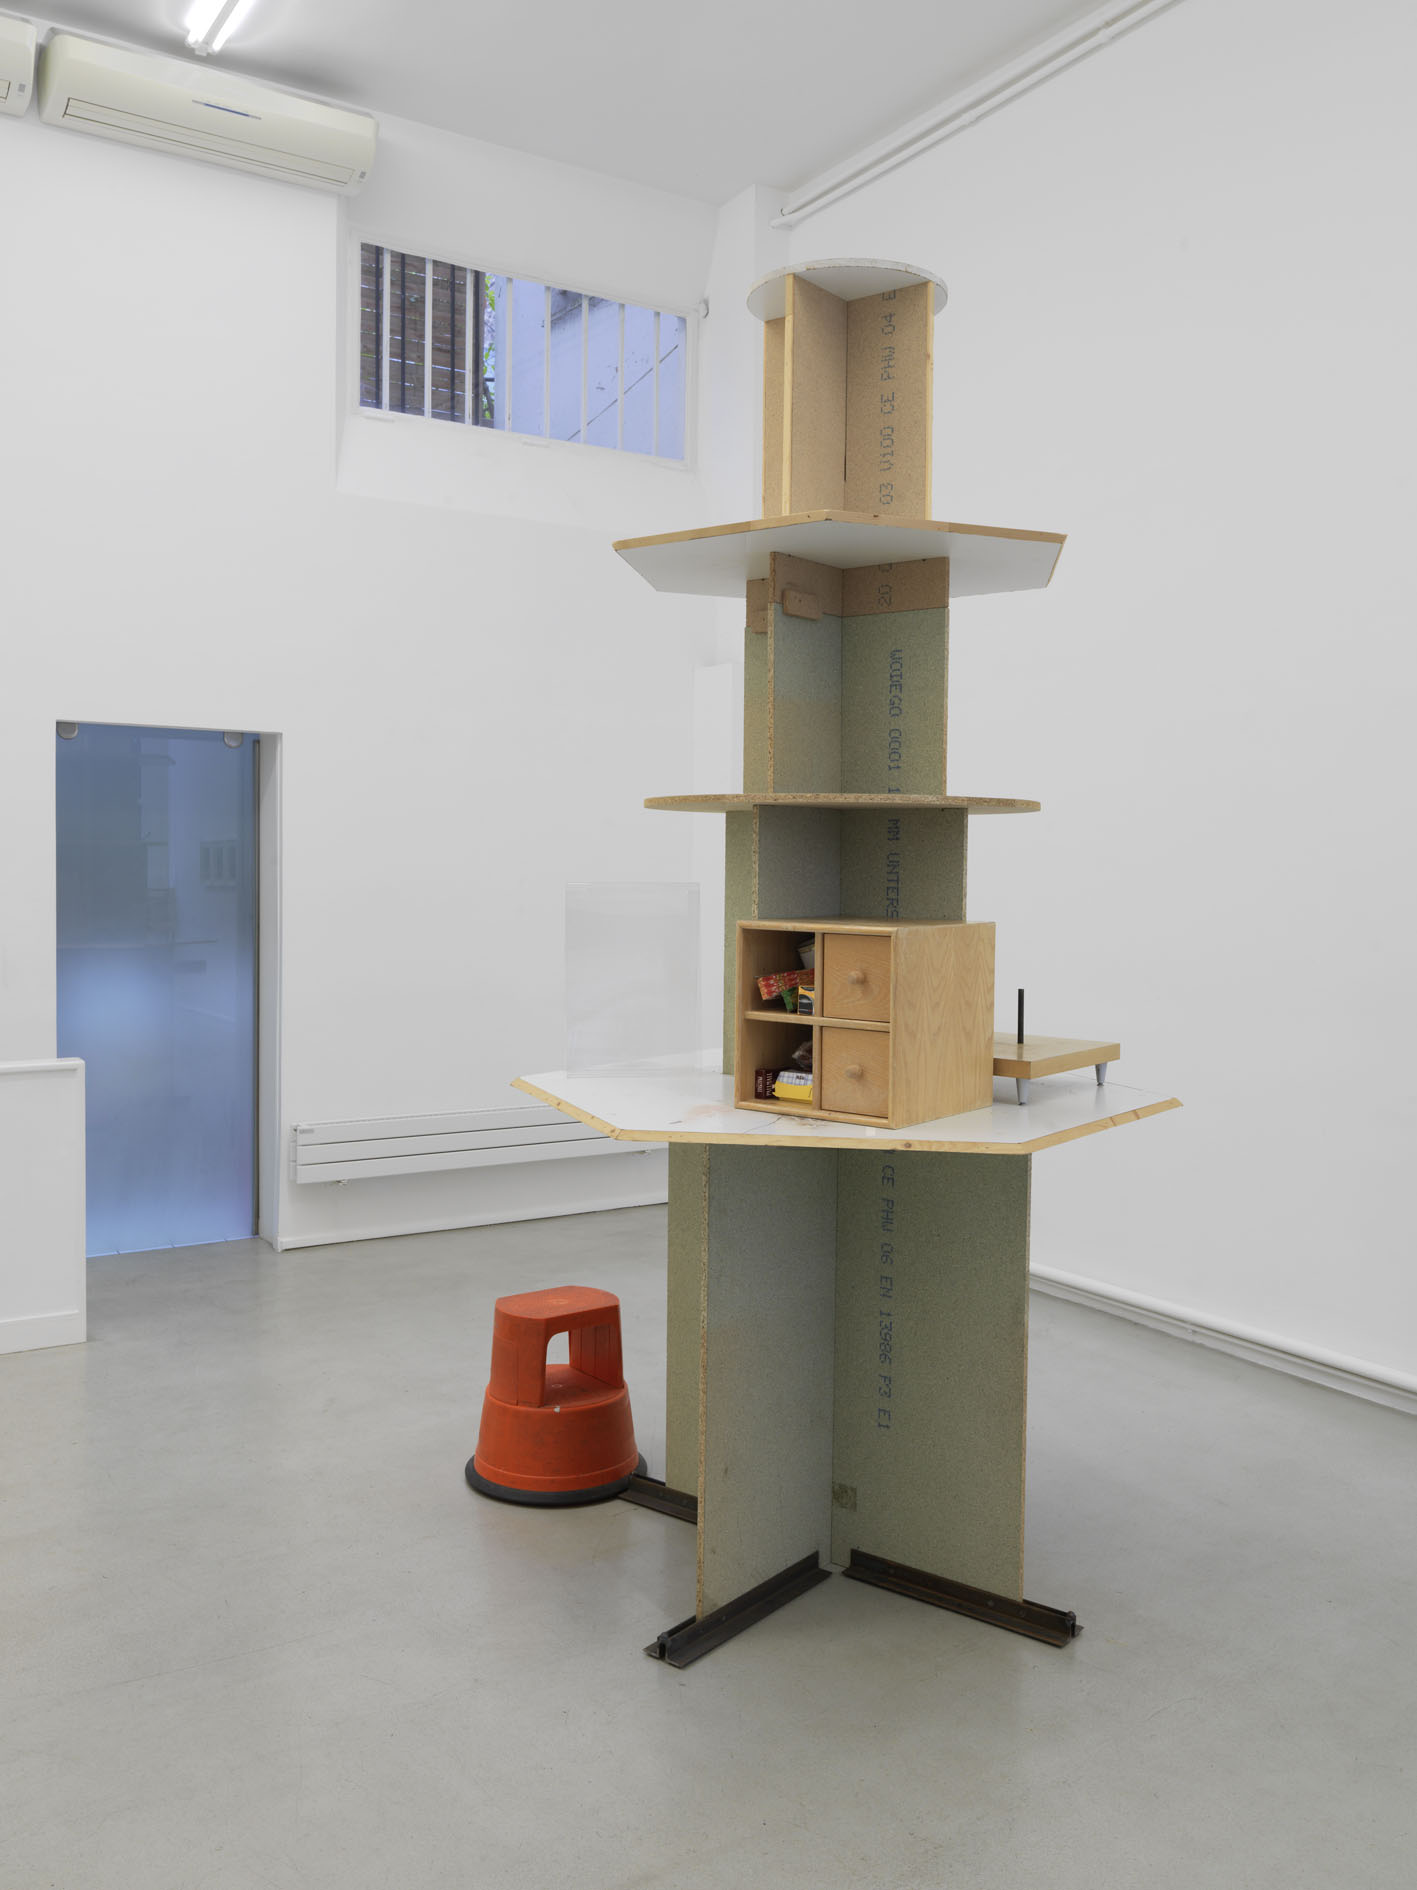 Manfred Pernice Untitled (AVA), 2008